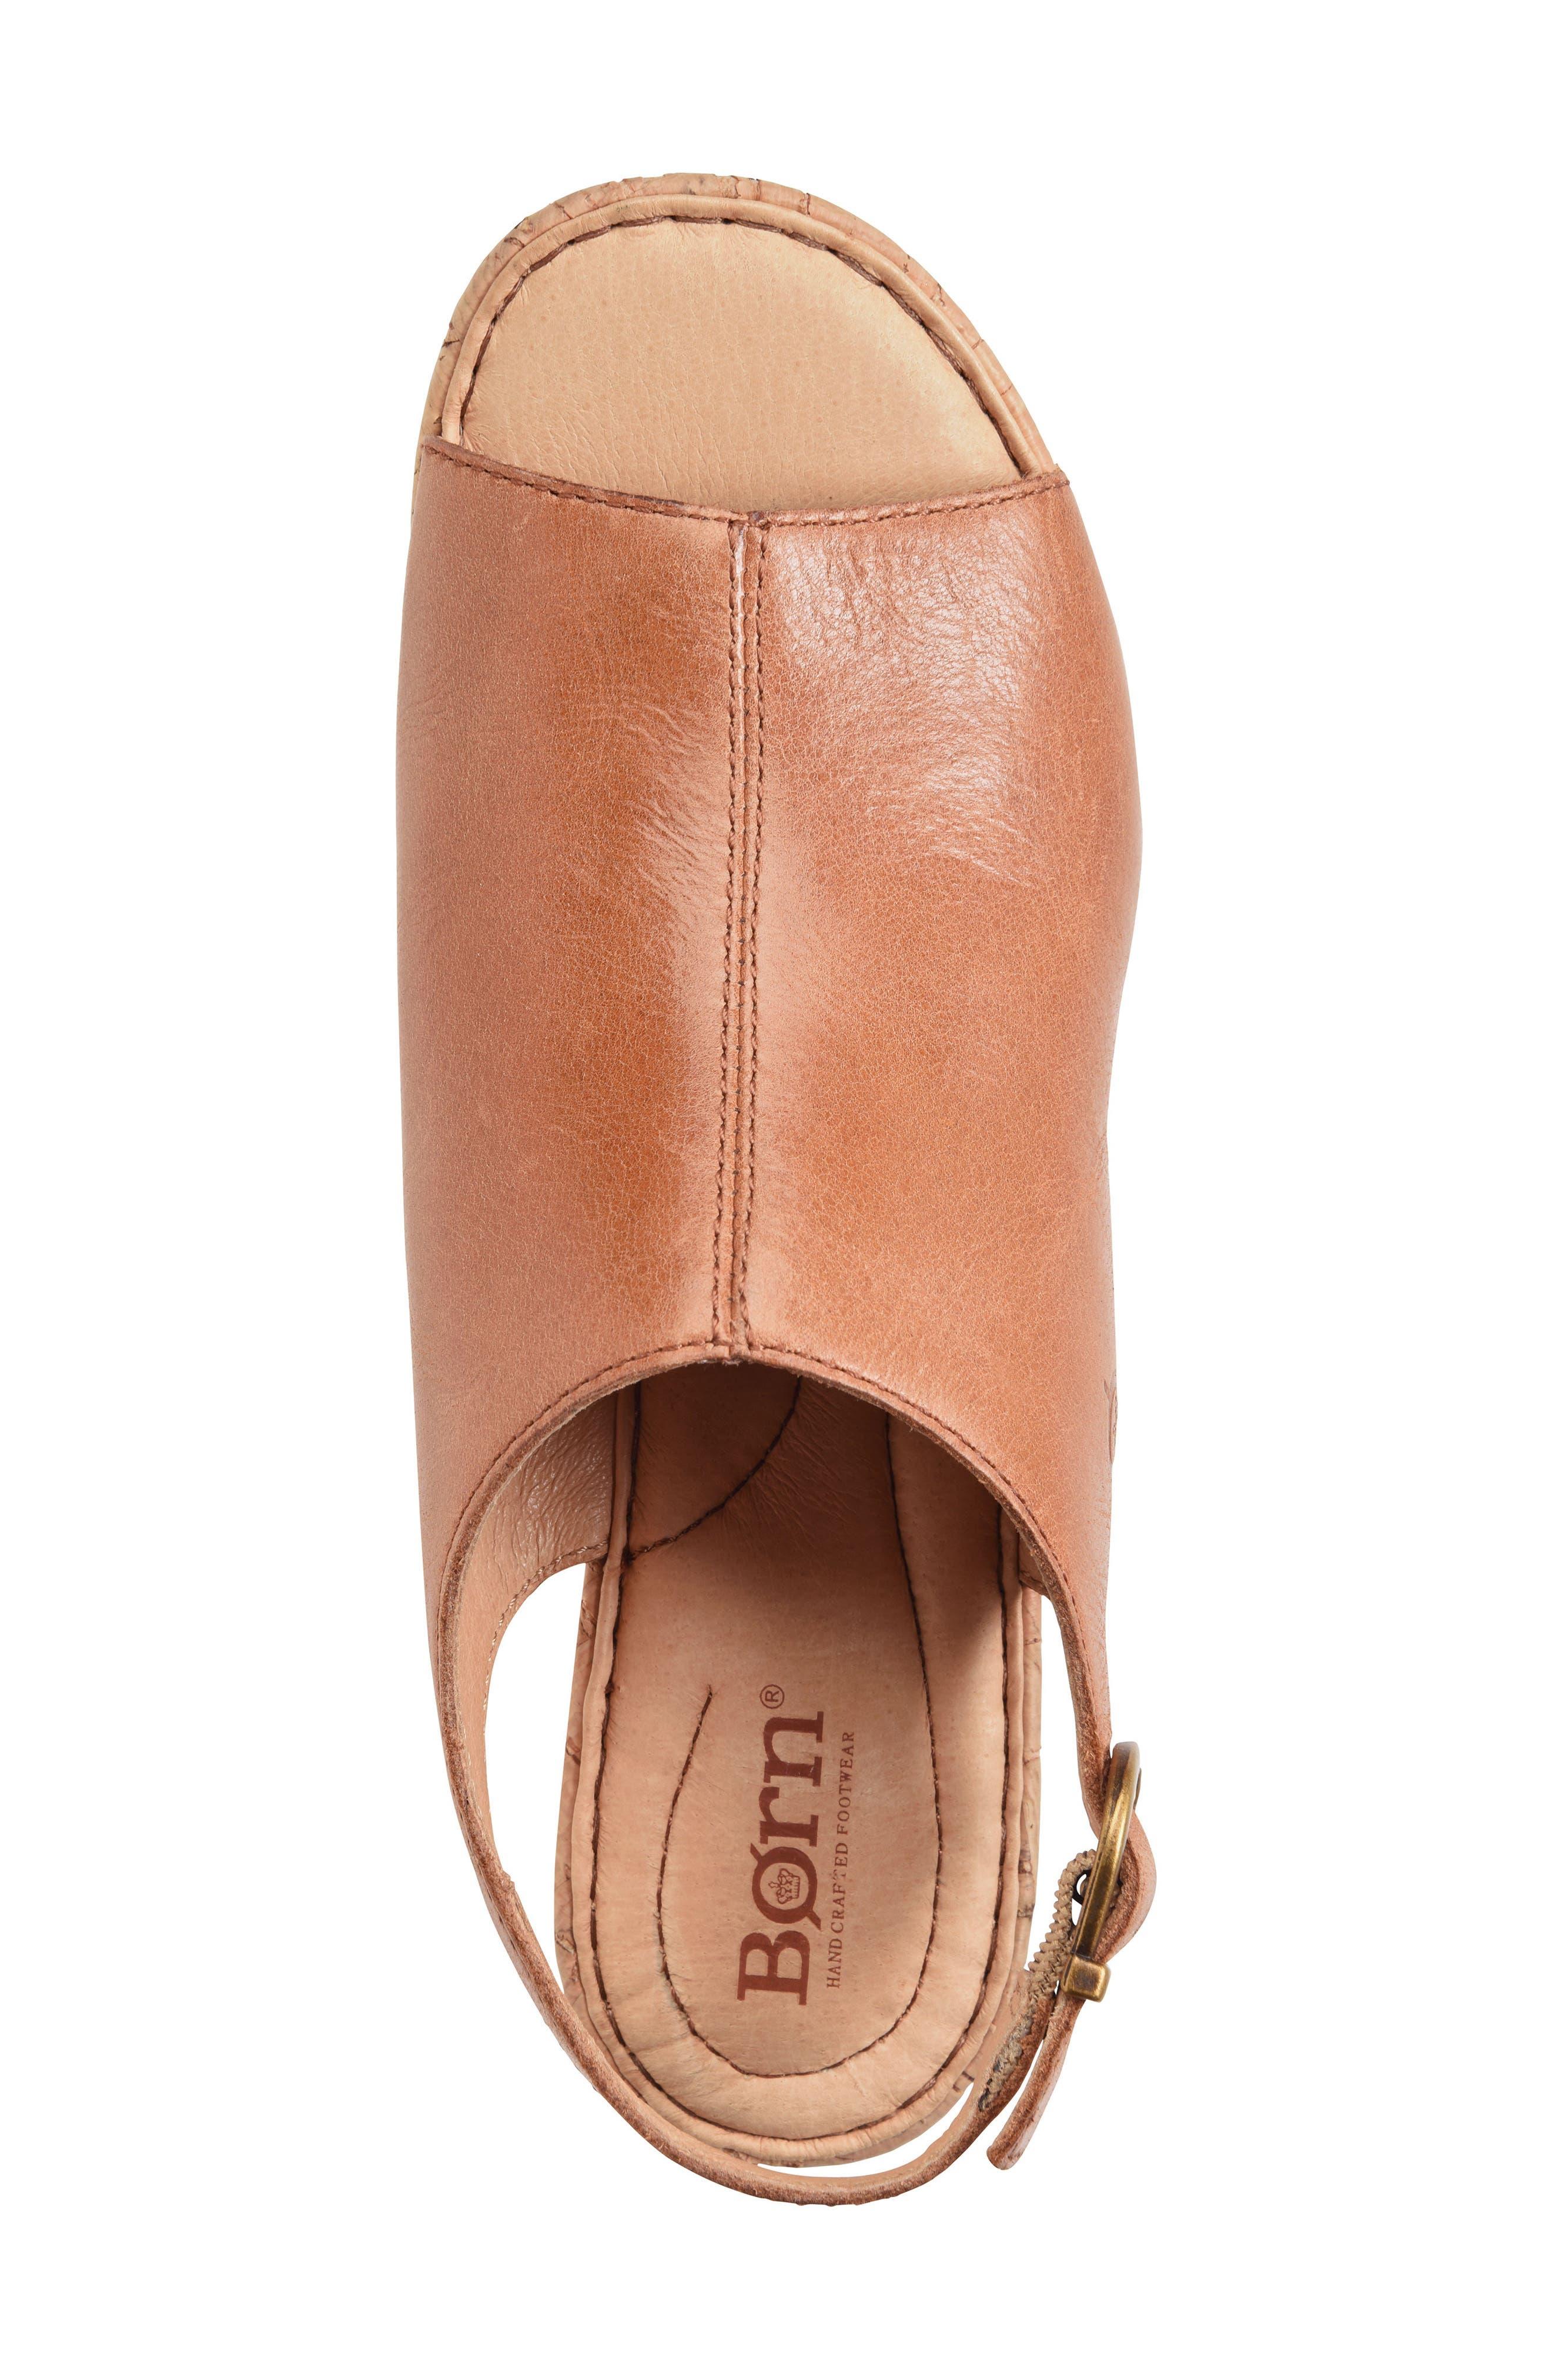 Orbit Platform Wedge Sandal,                             Alternate thumbnail 5, color,                             Brown Leather